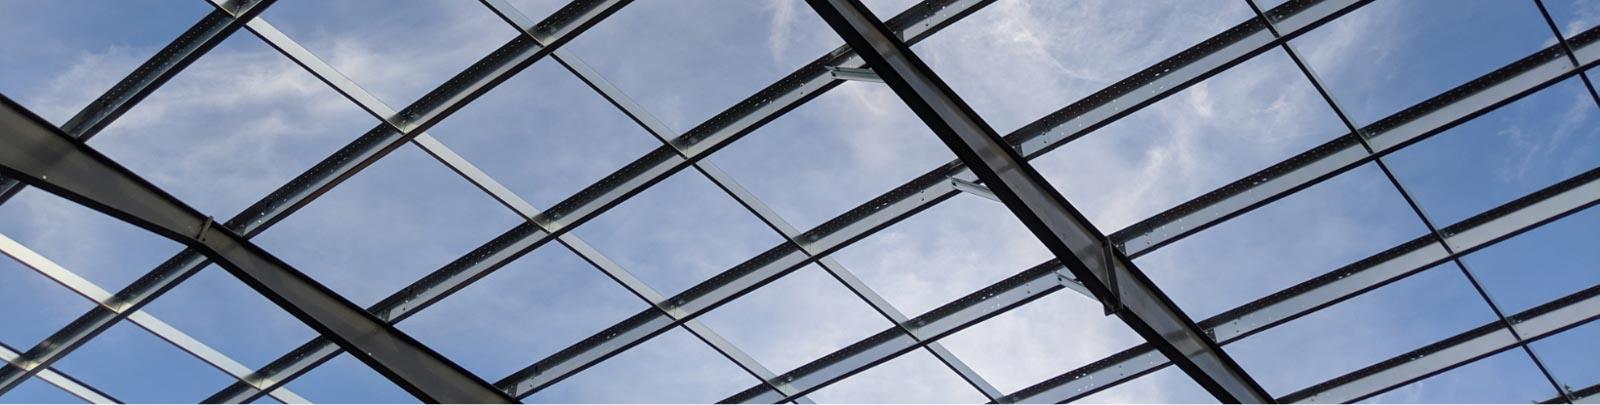 Skylight Design background